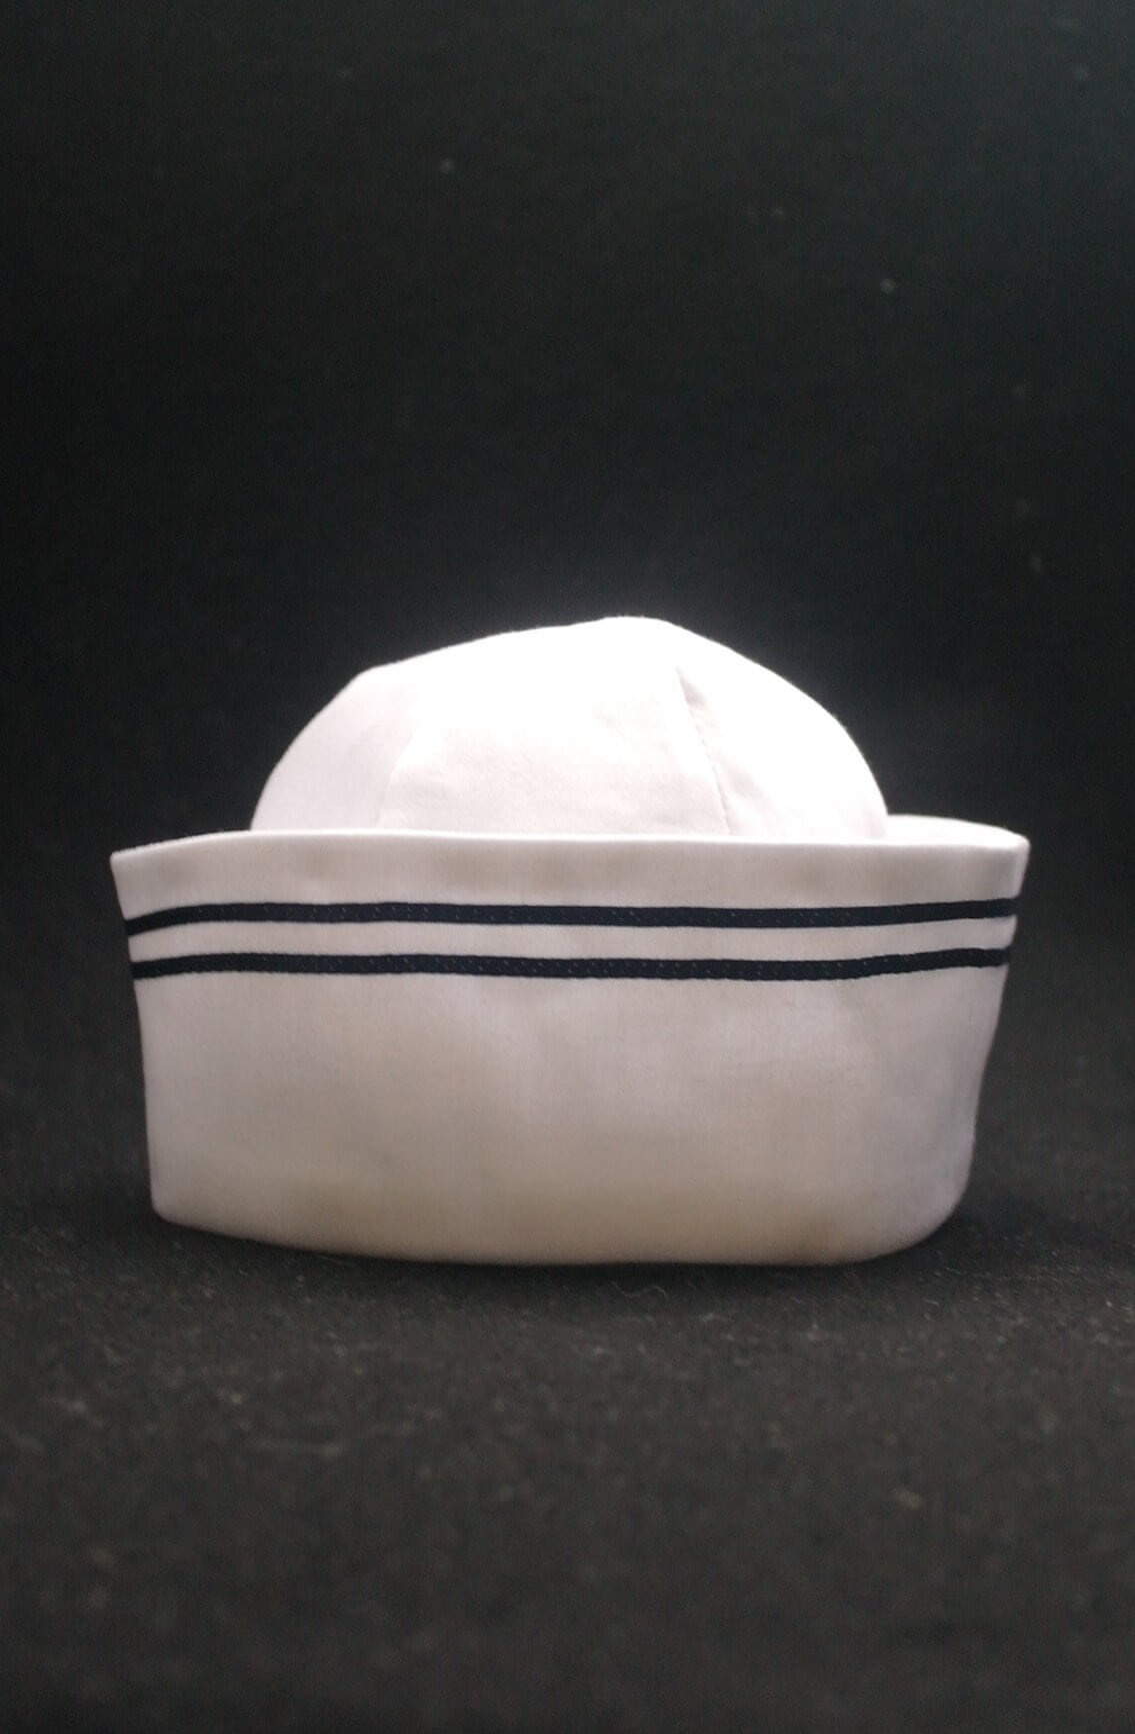 Matrosluen til Sjømanns-dåpskjolen